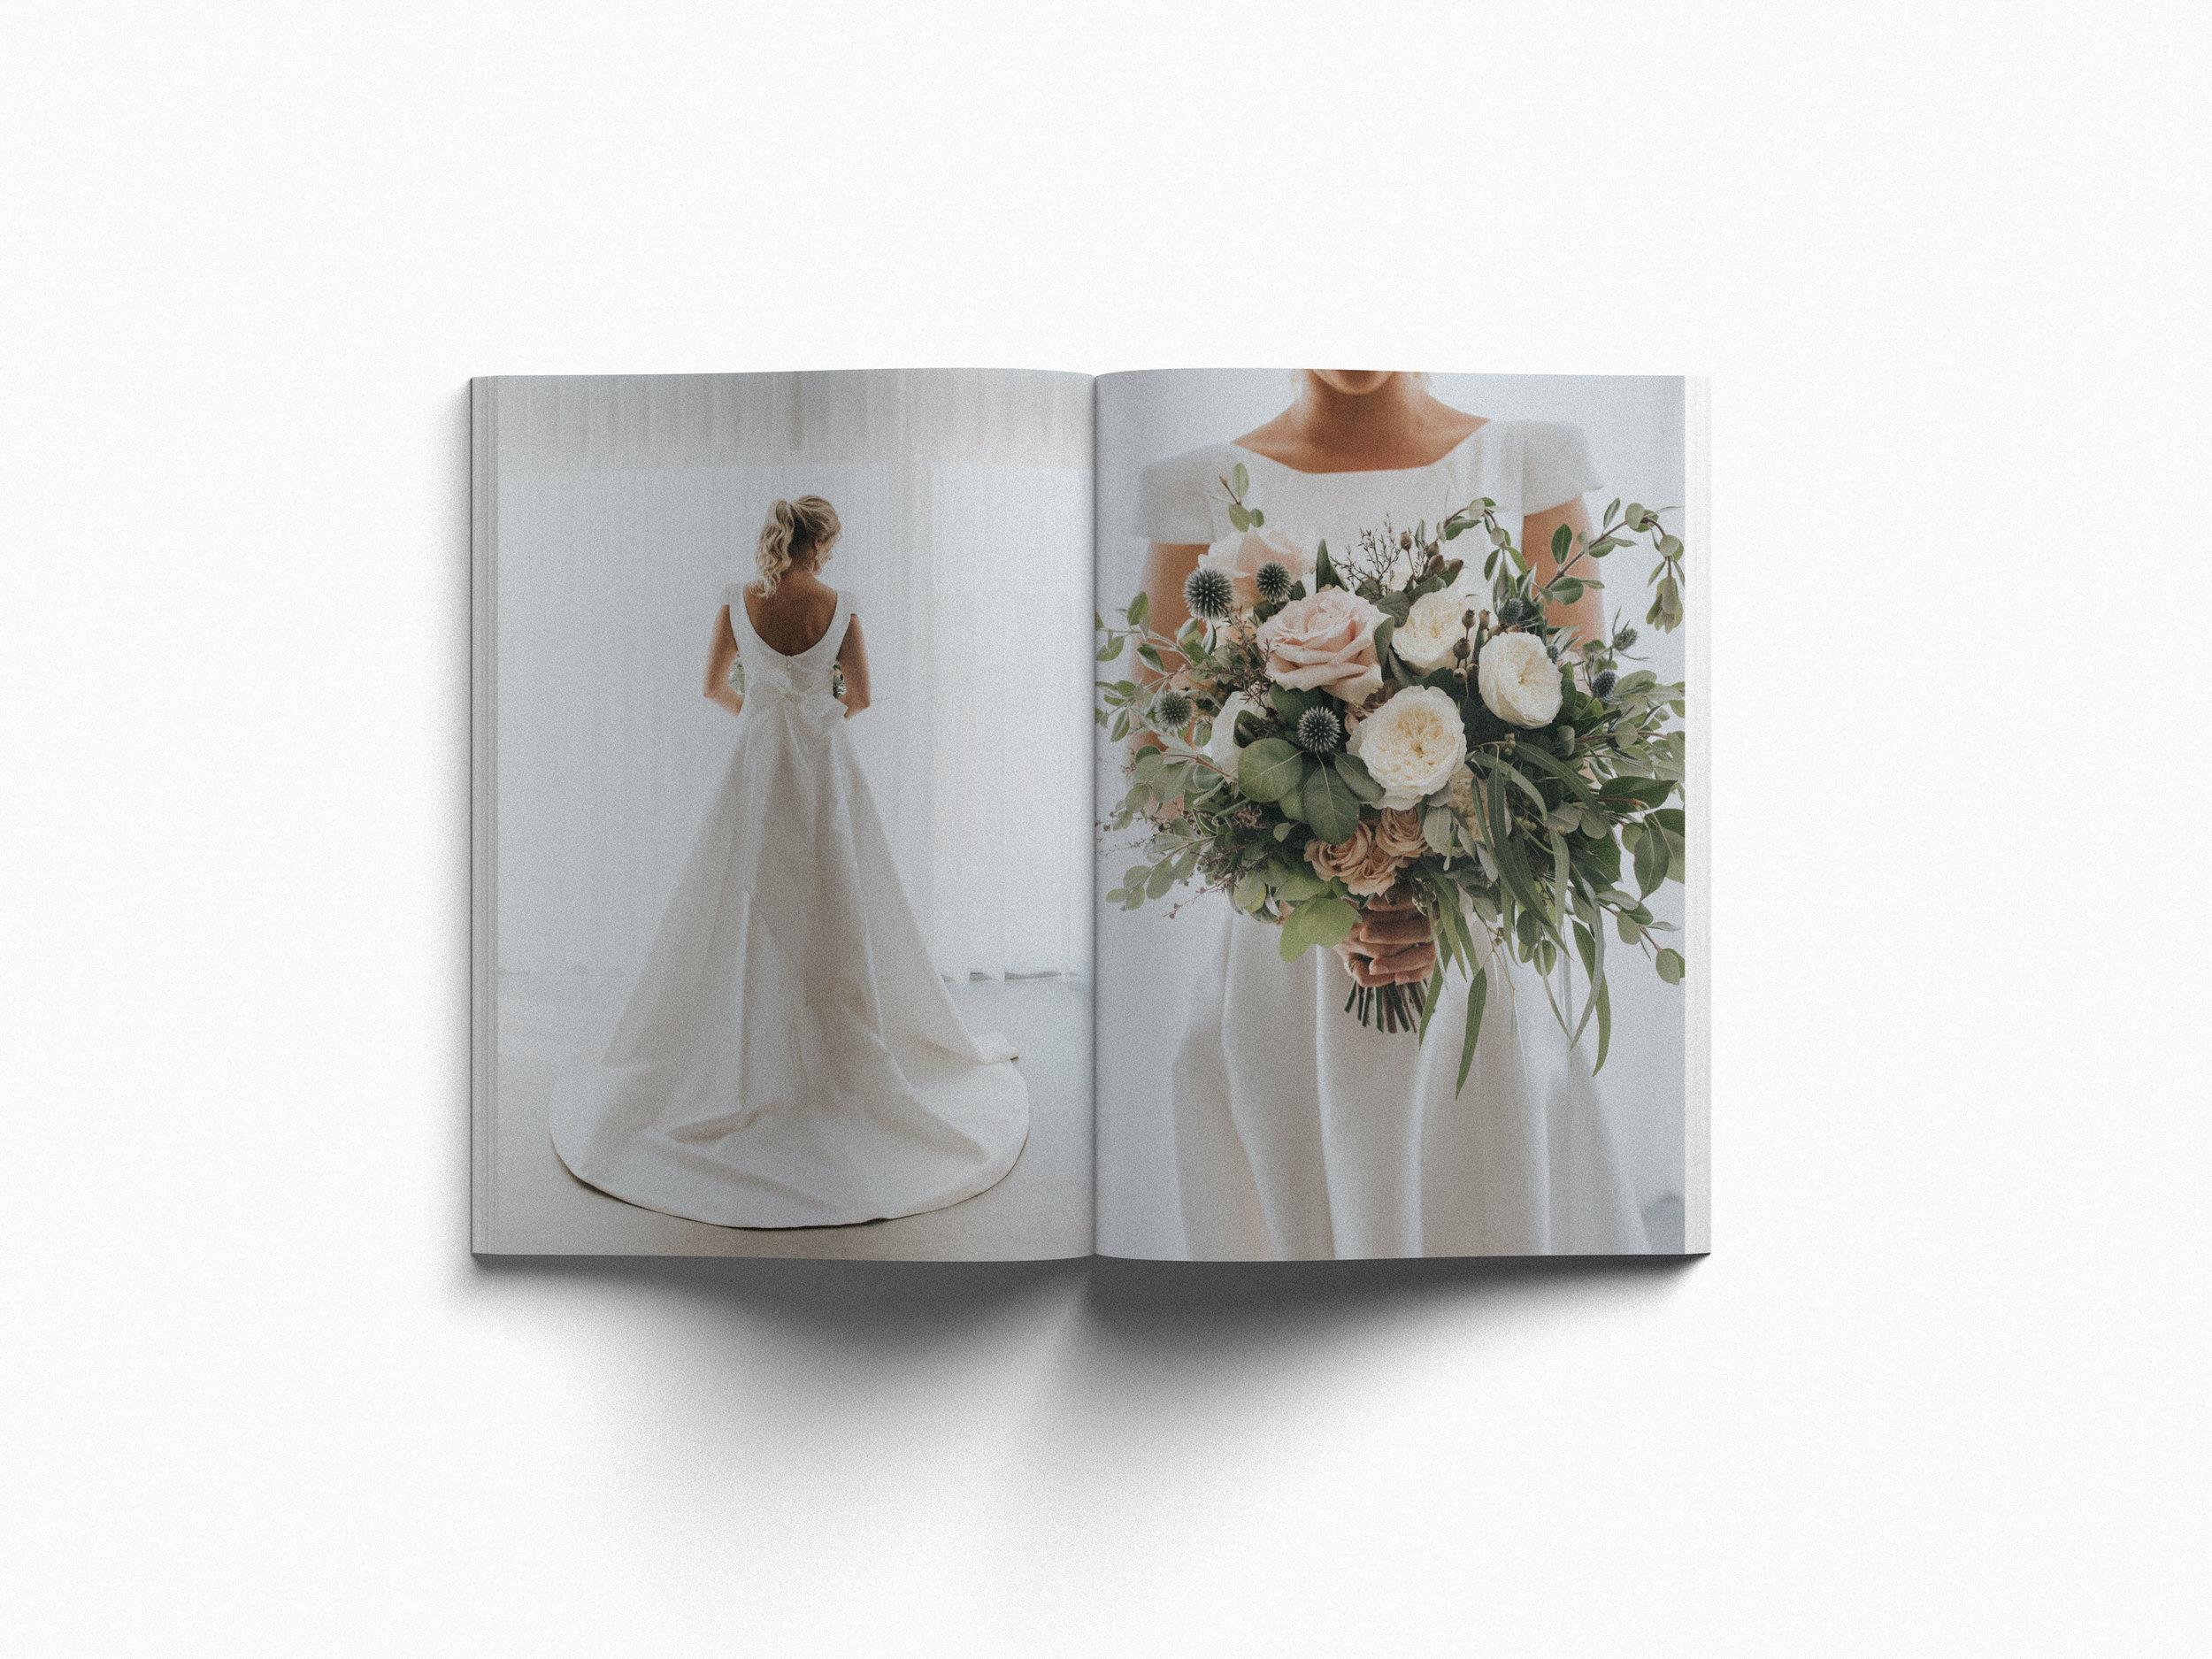 Jacqs-Lucas-Wedding-Zine-Internal-Page-3.png